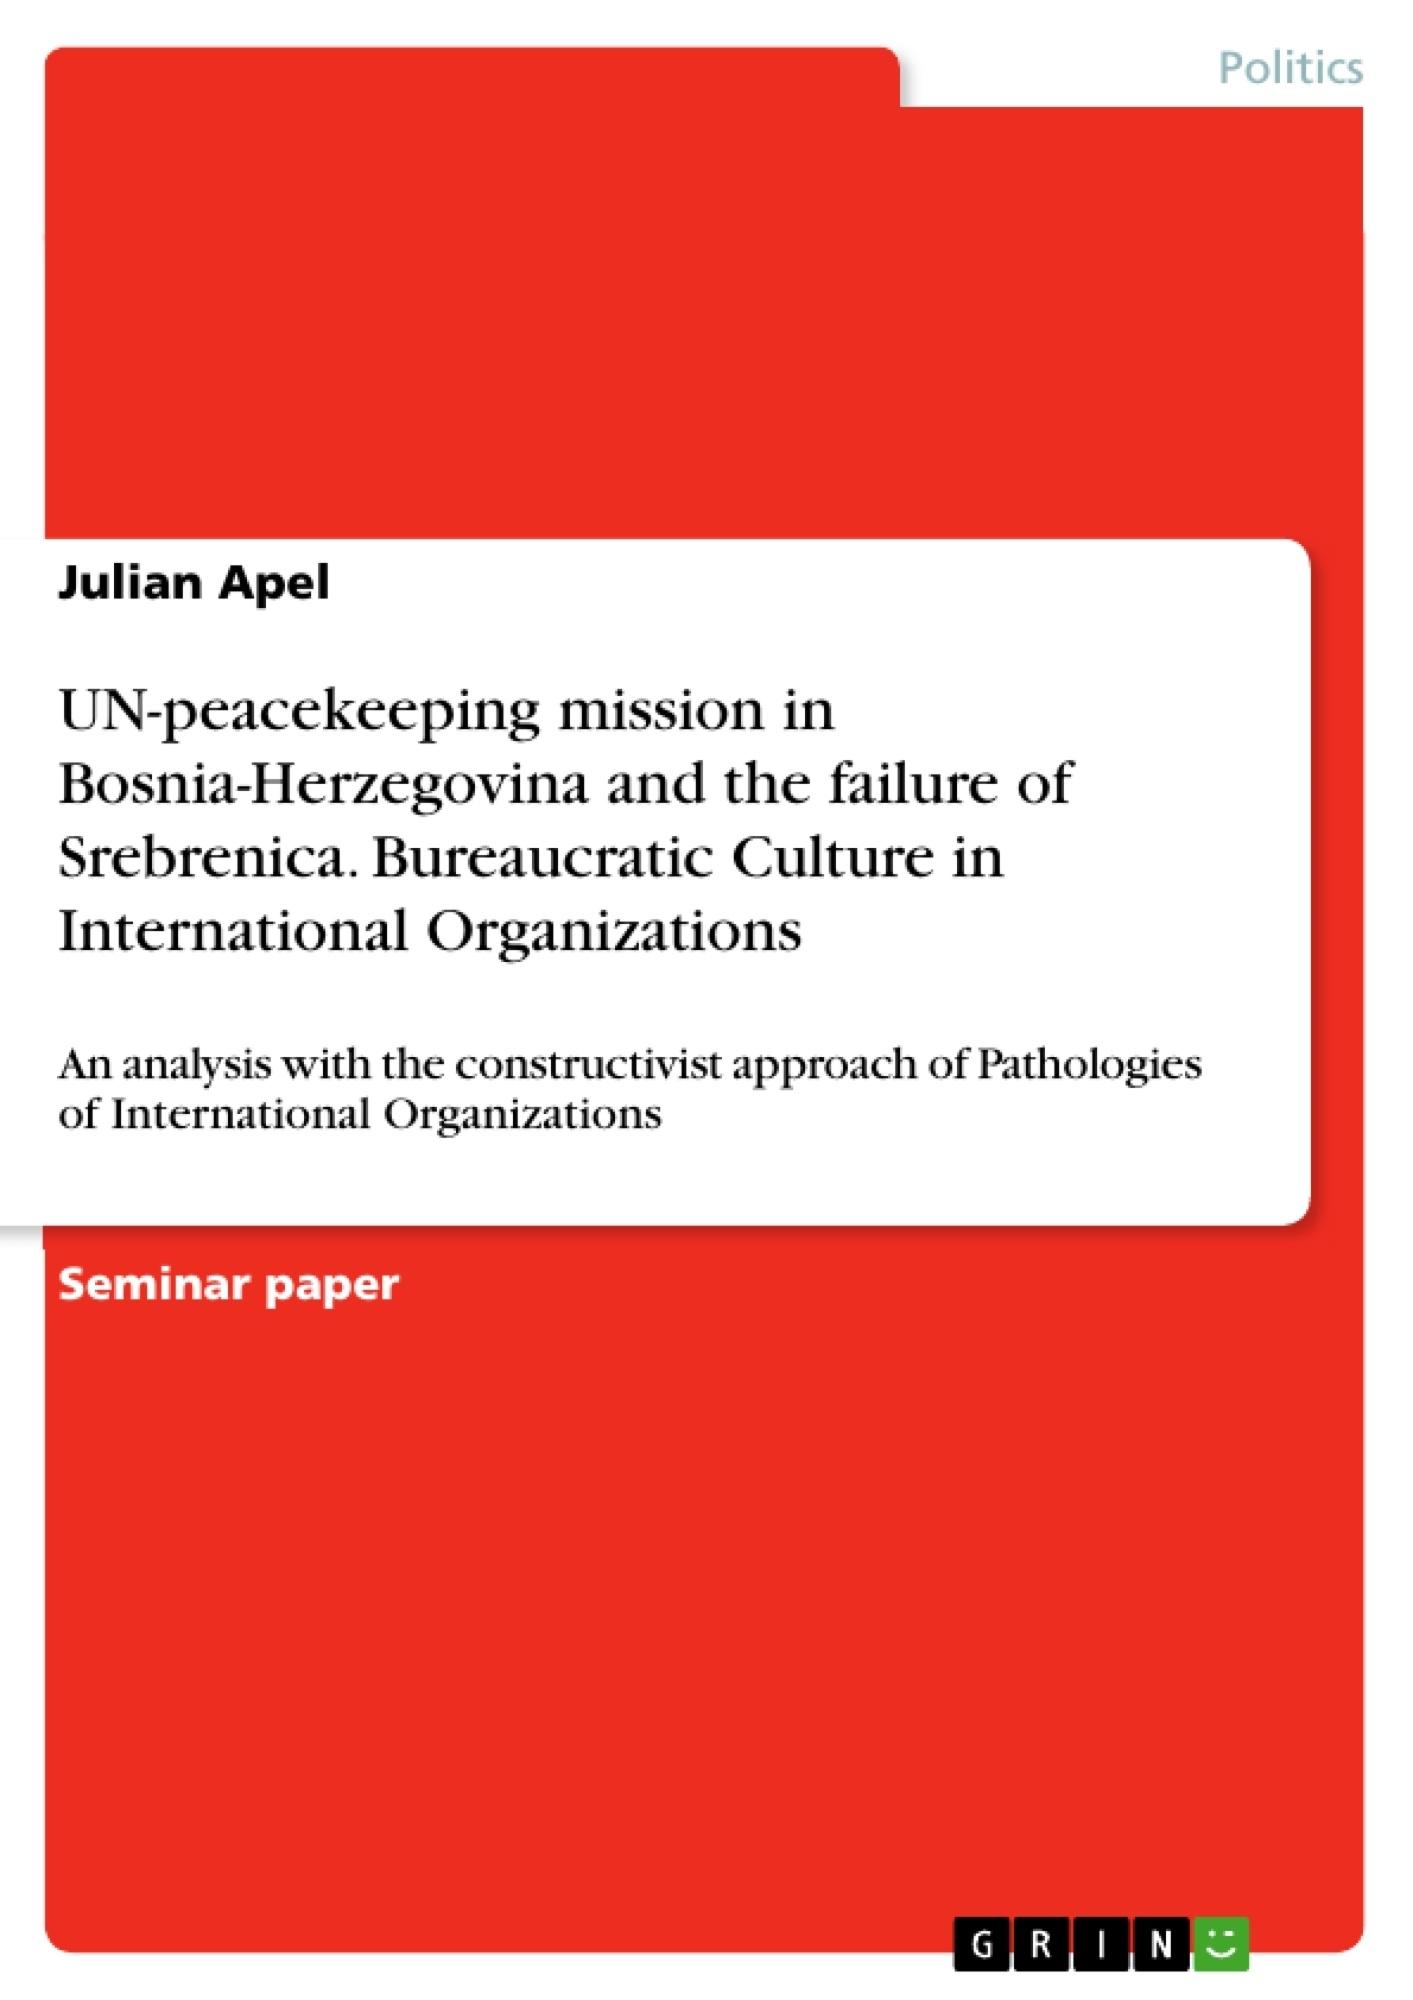 Title: UN-peacekeeping mission in Bosnia-Herzegovina and the failure of Srebrenica. Bureaucratic Culture in International Organizations